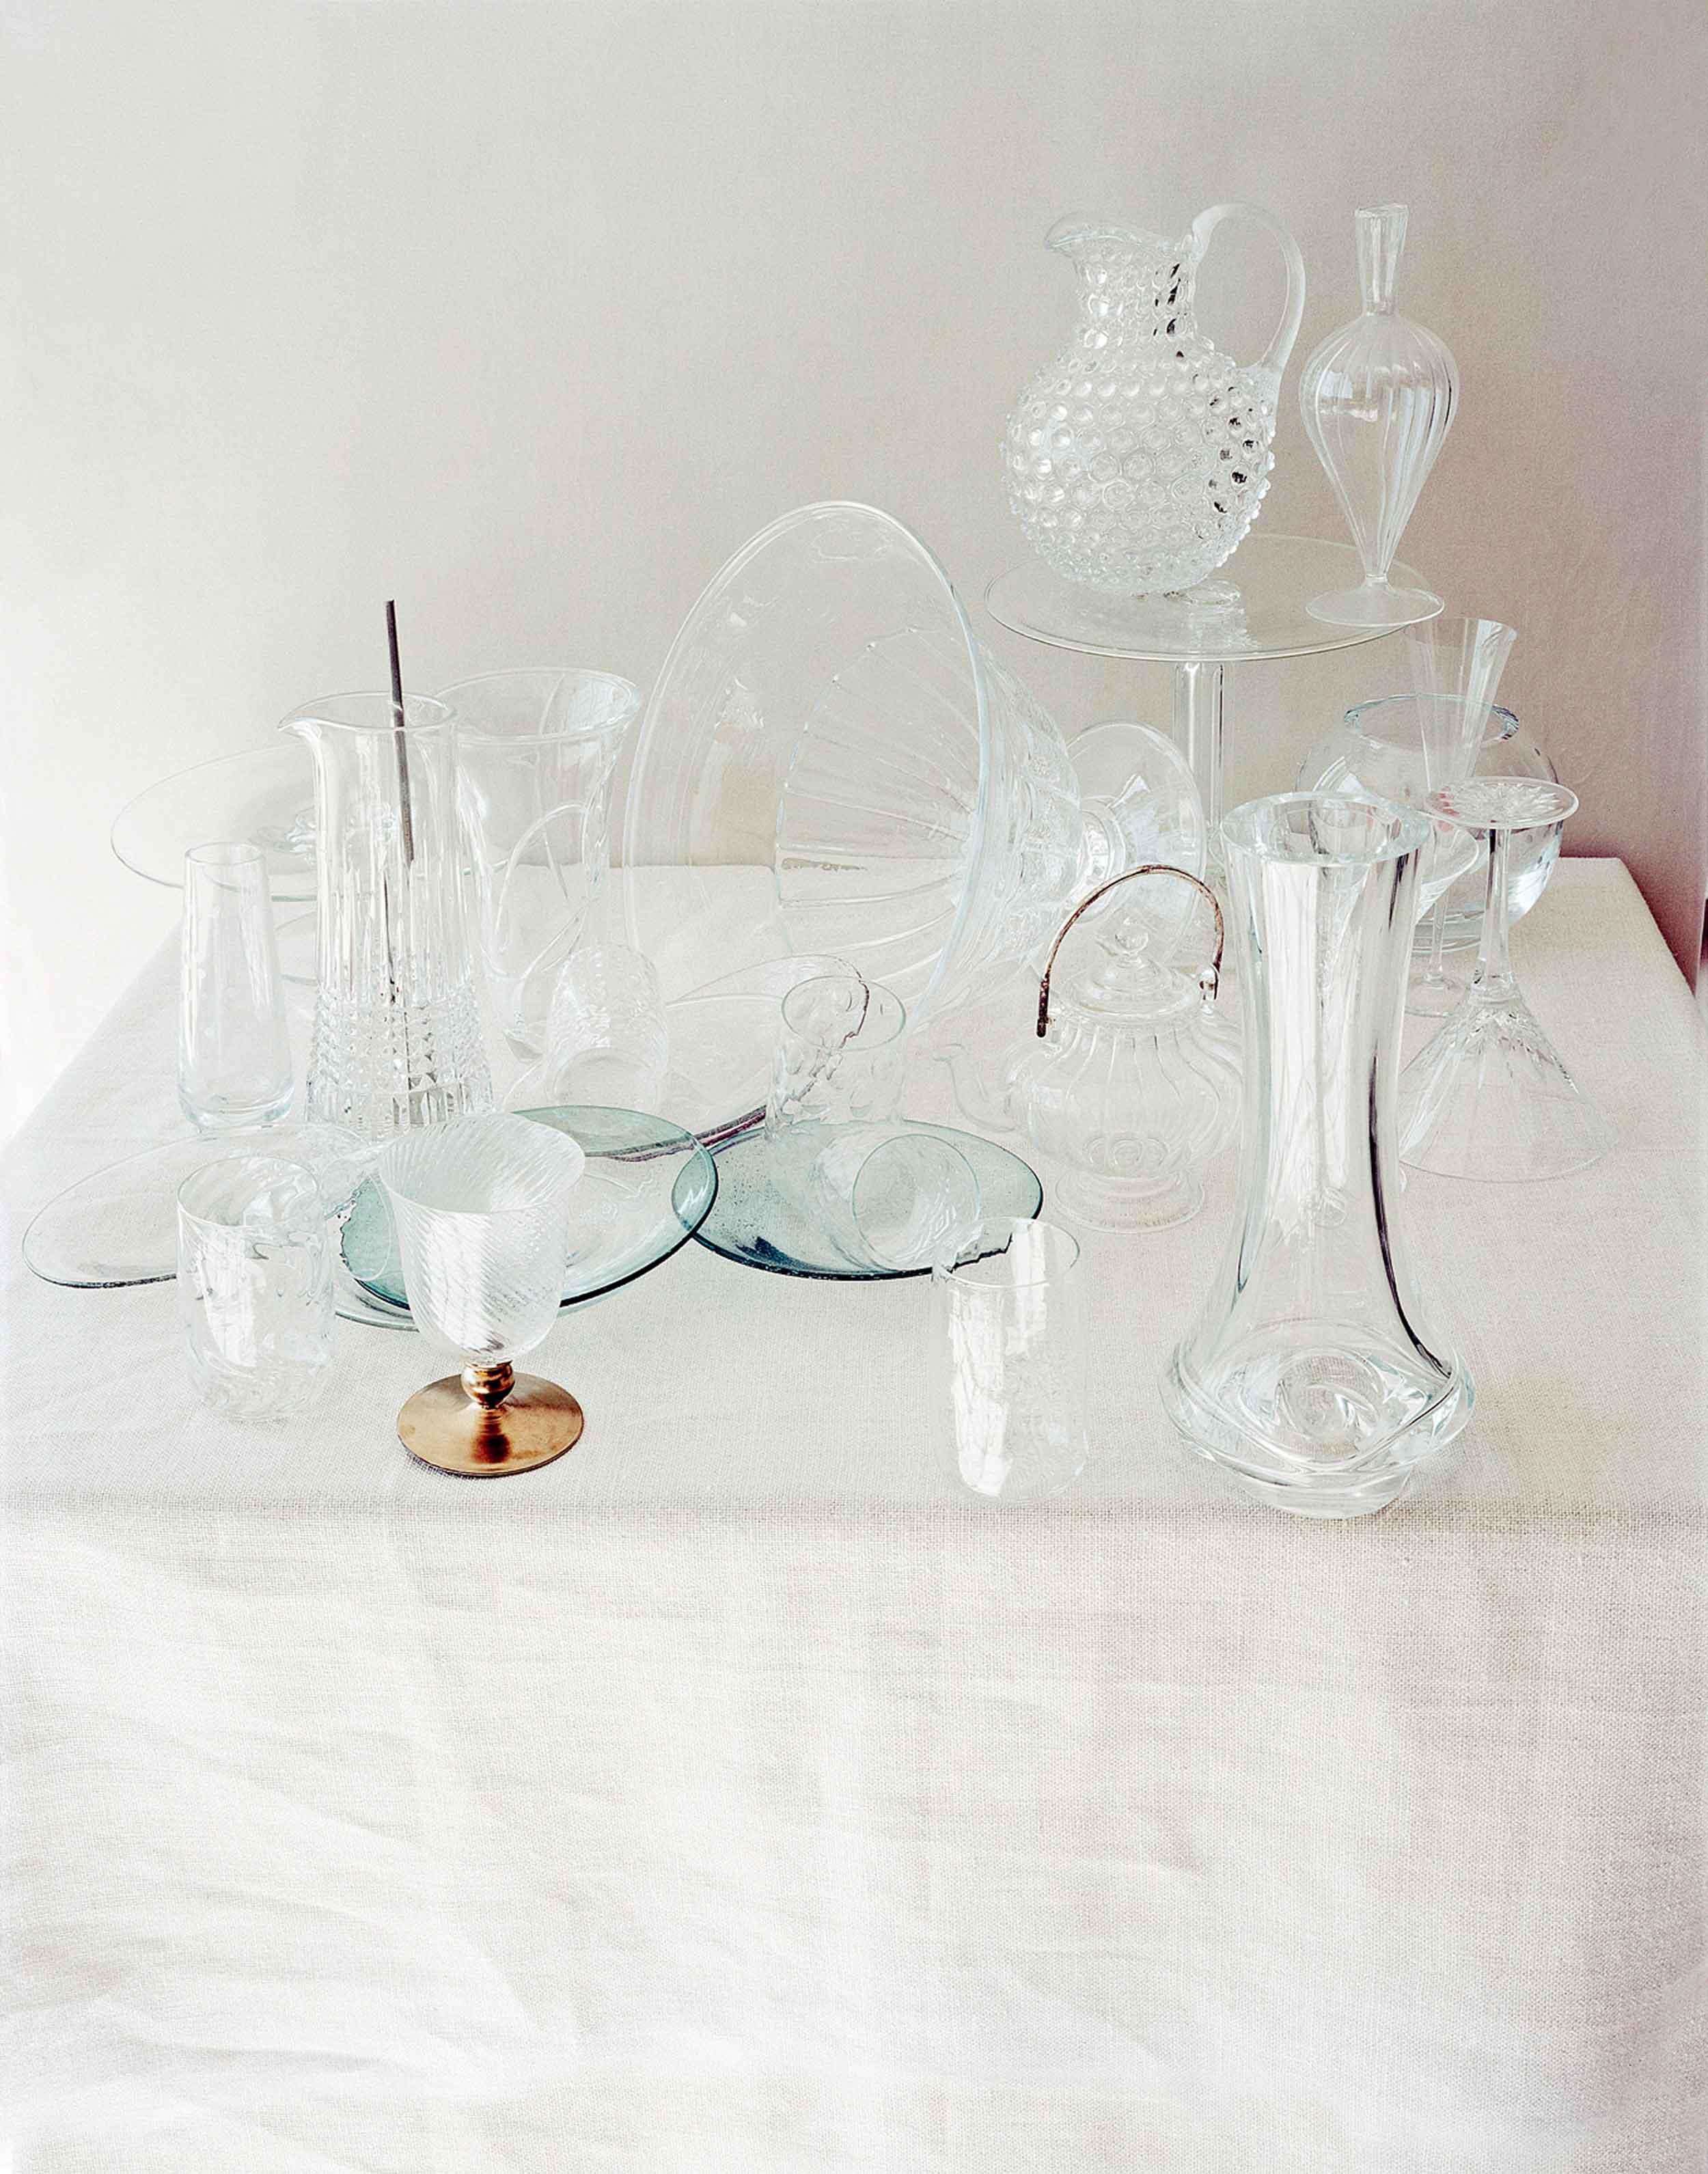 brides-tabletop-laura-letinsky-1.jpg